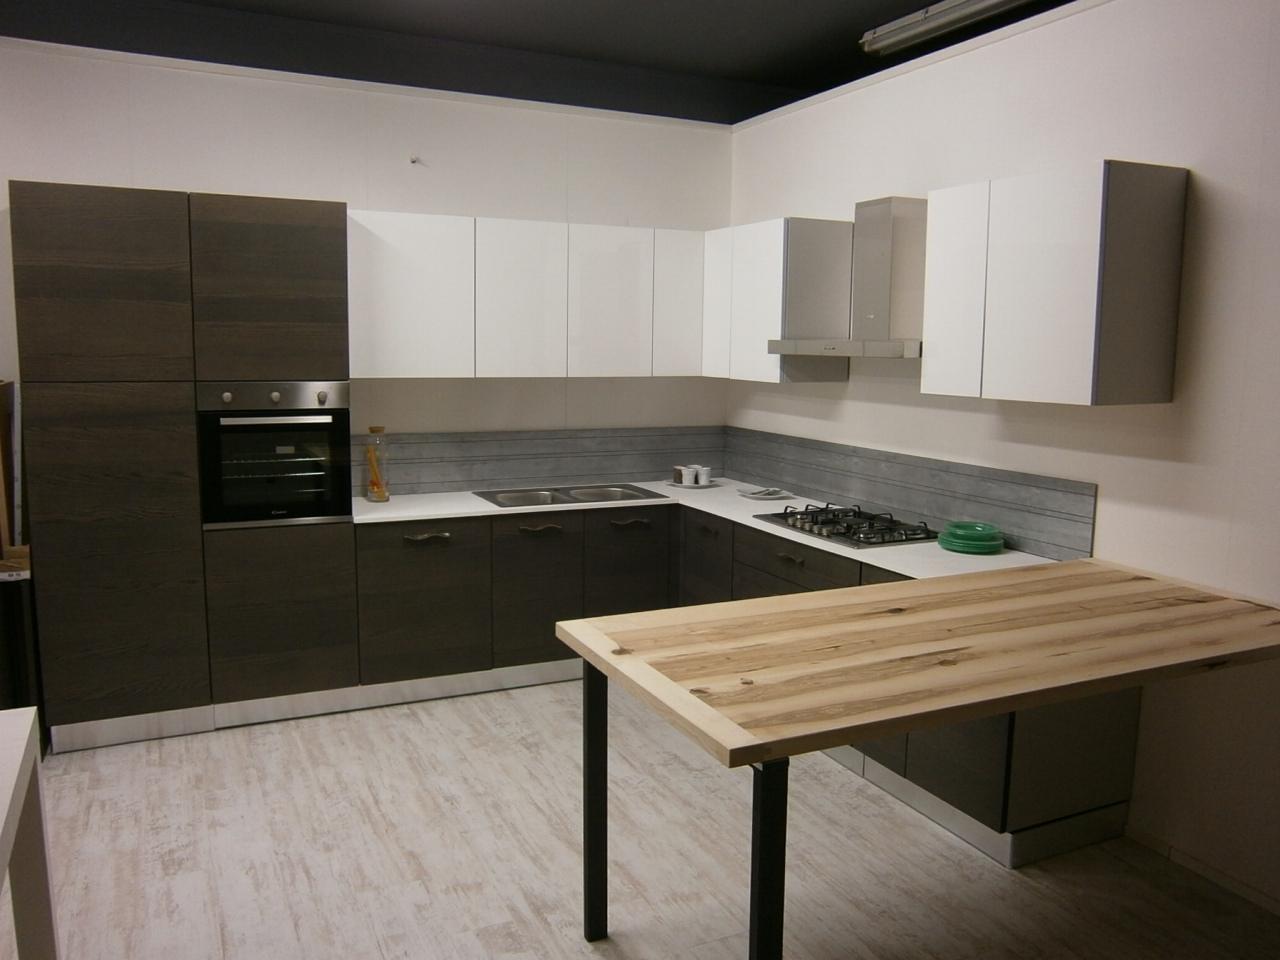 Arrex 2 cucina corallo moderne legno cucine a prezzi for Outlet cucine moderne